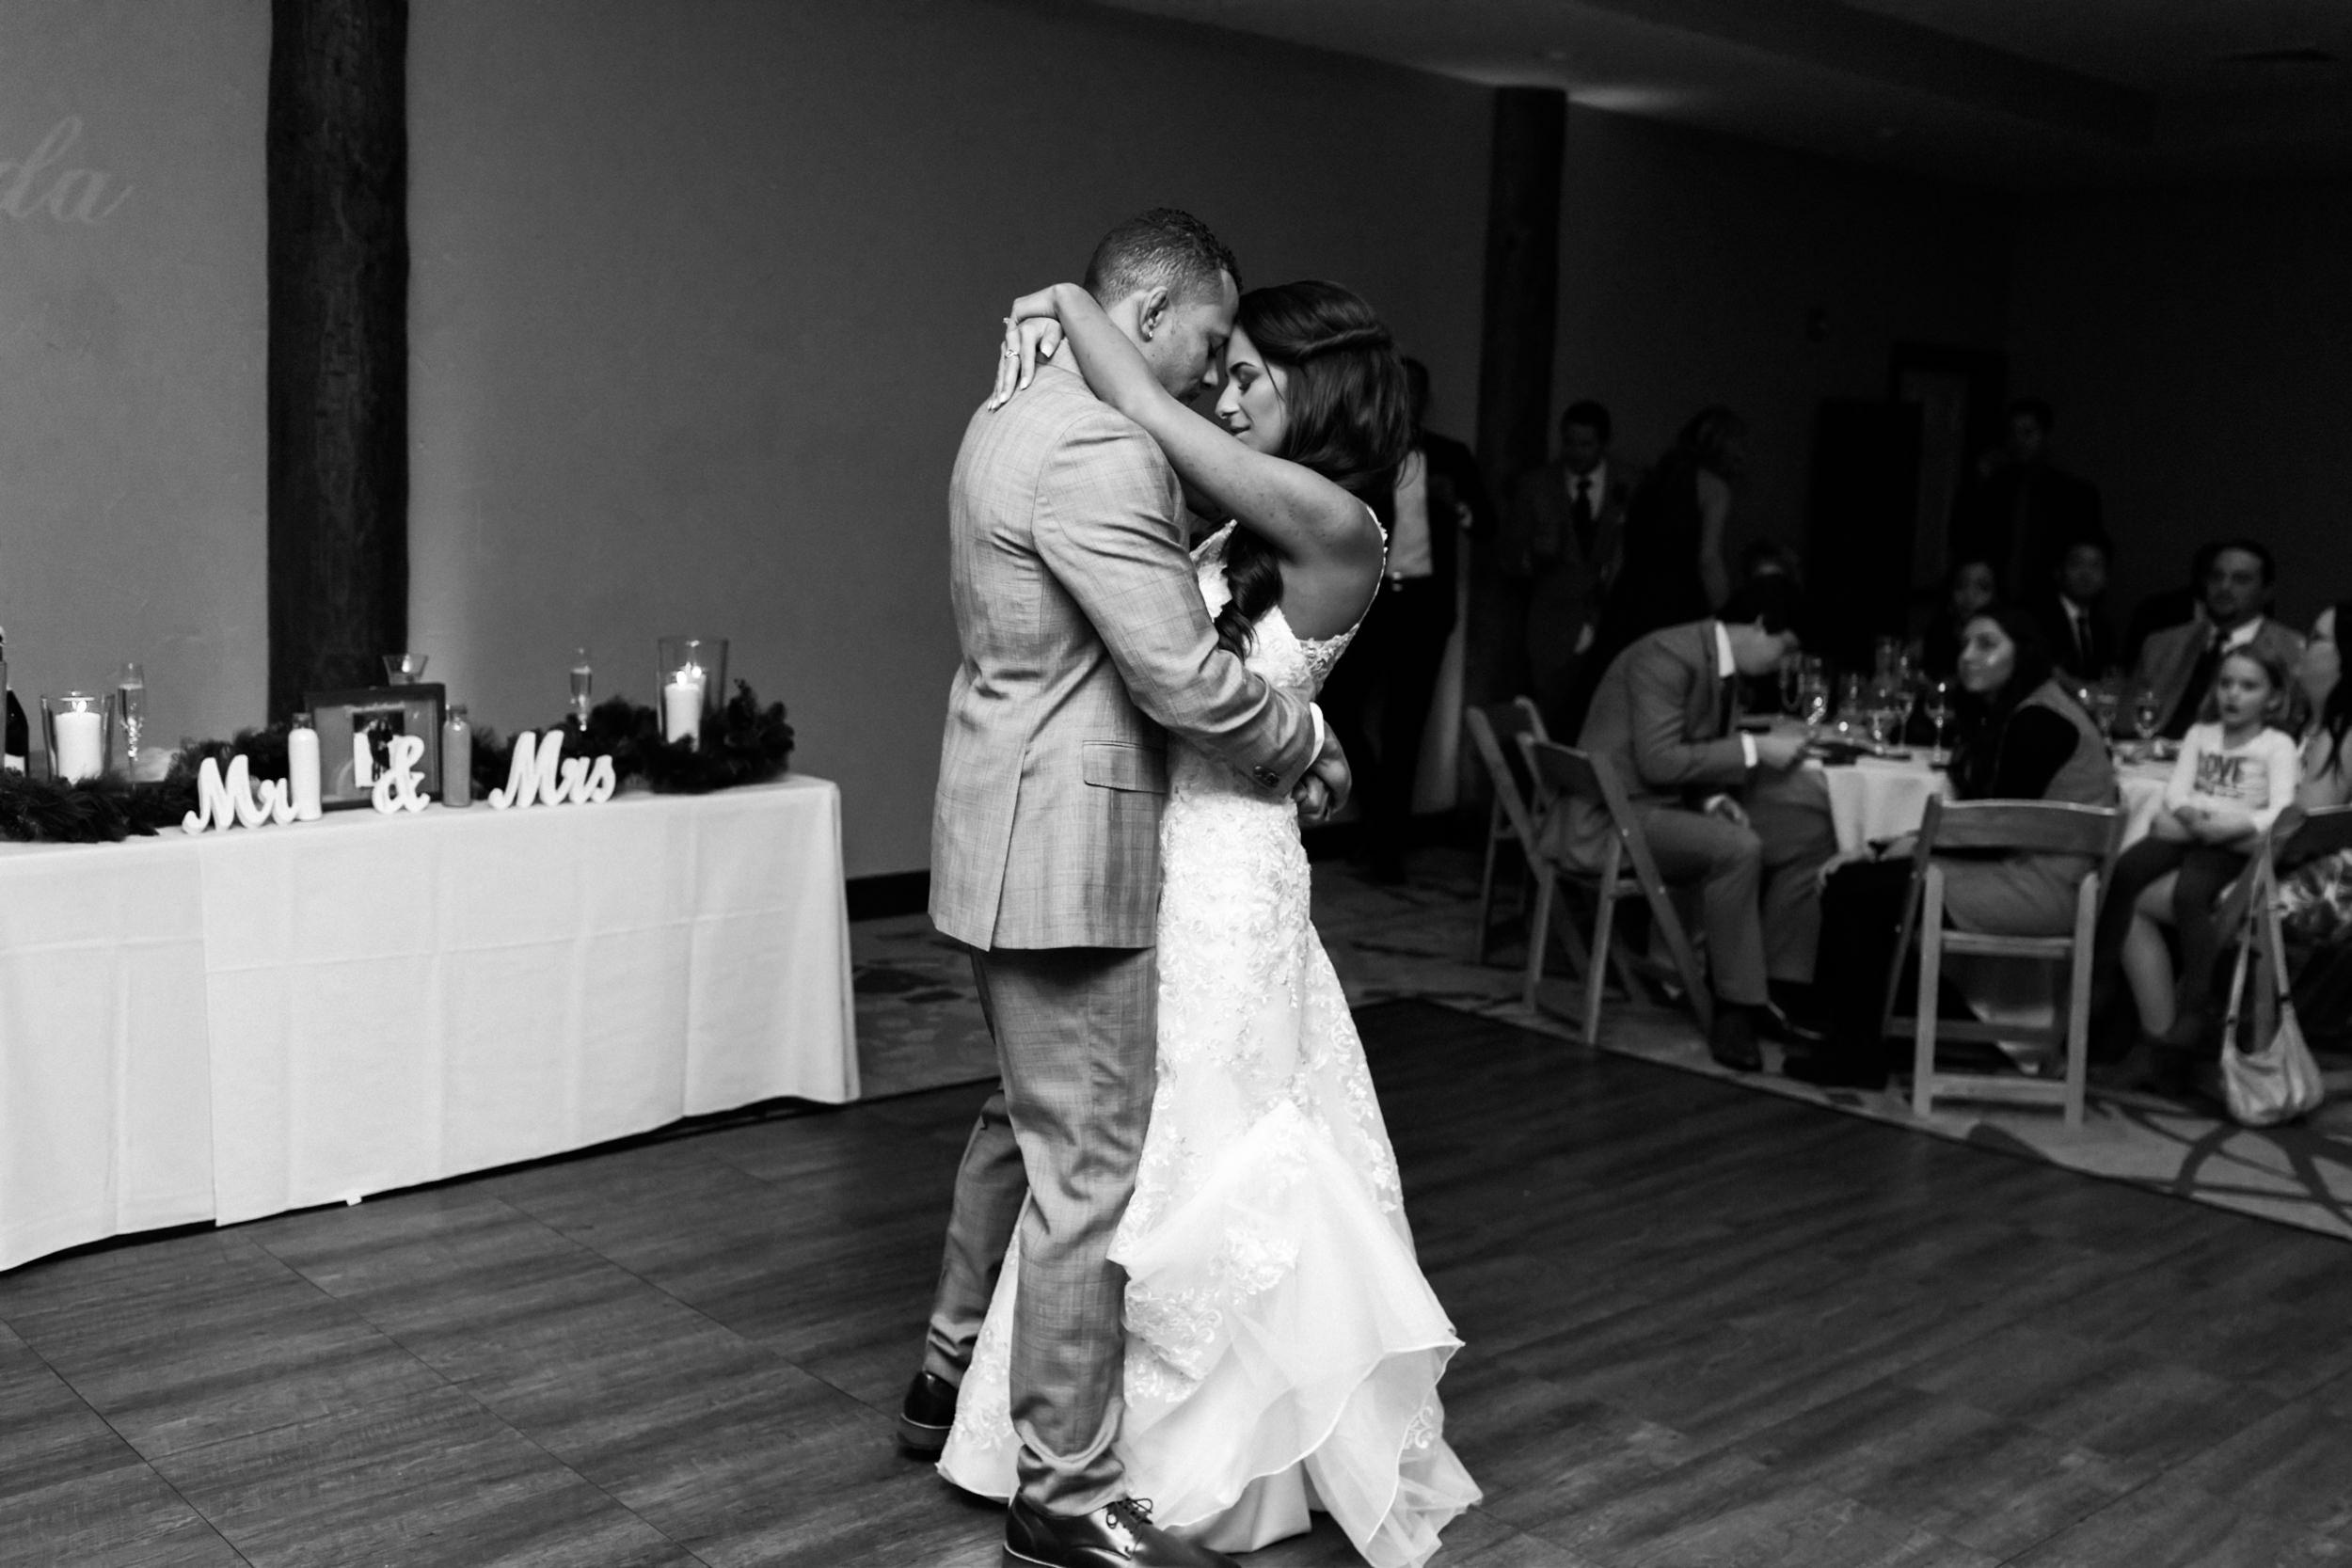 Colorado-Wedding-Photographer-Breckinridge-Mountain-Adventure-Elopement-70.jpg